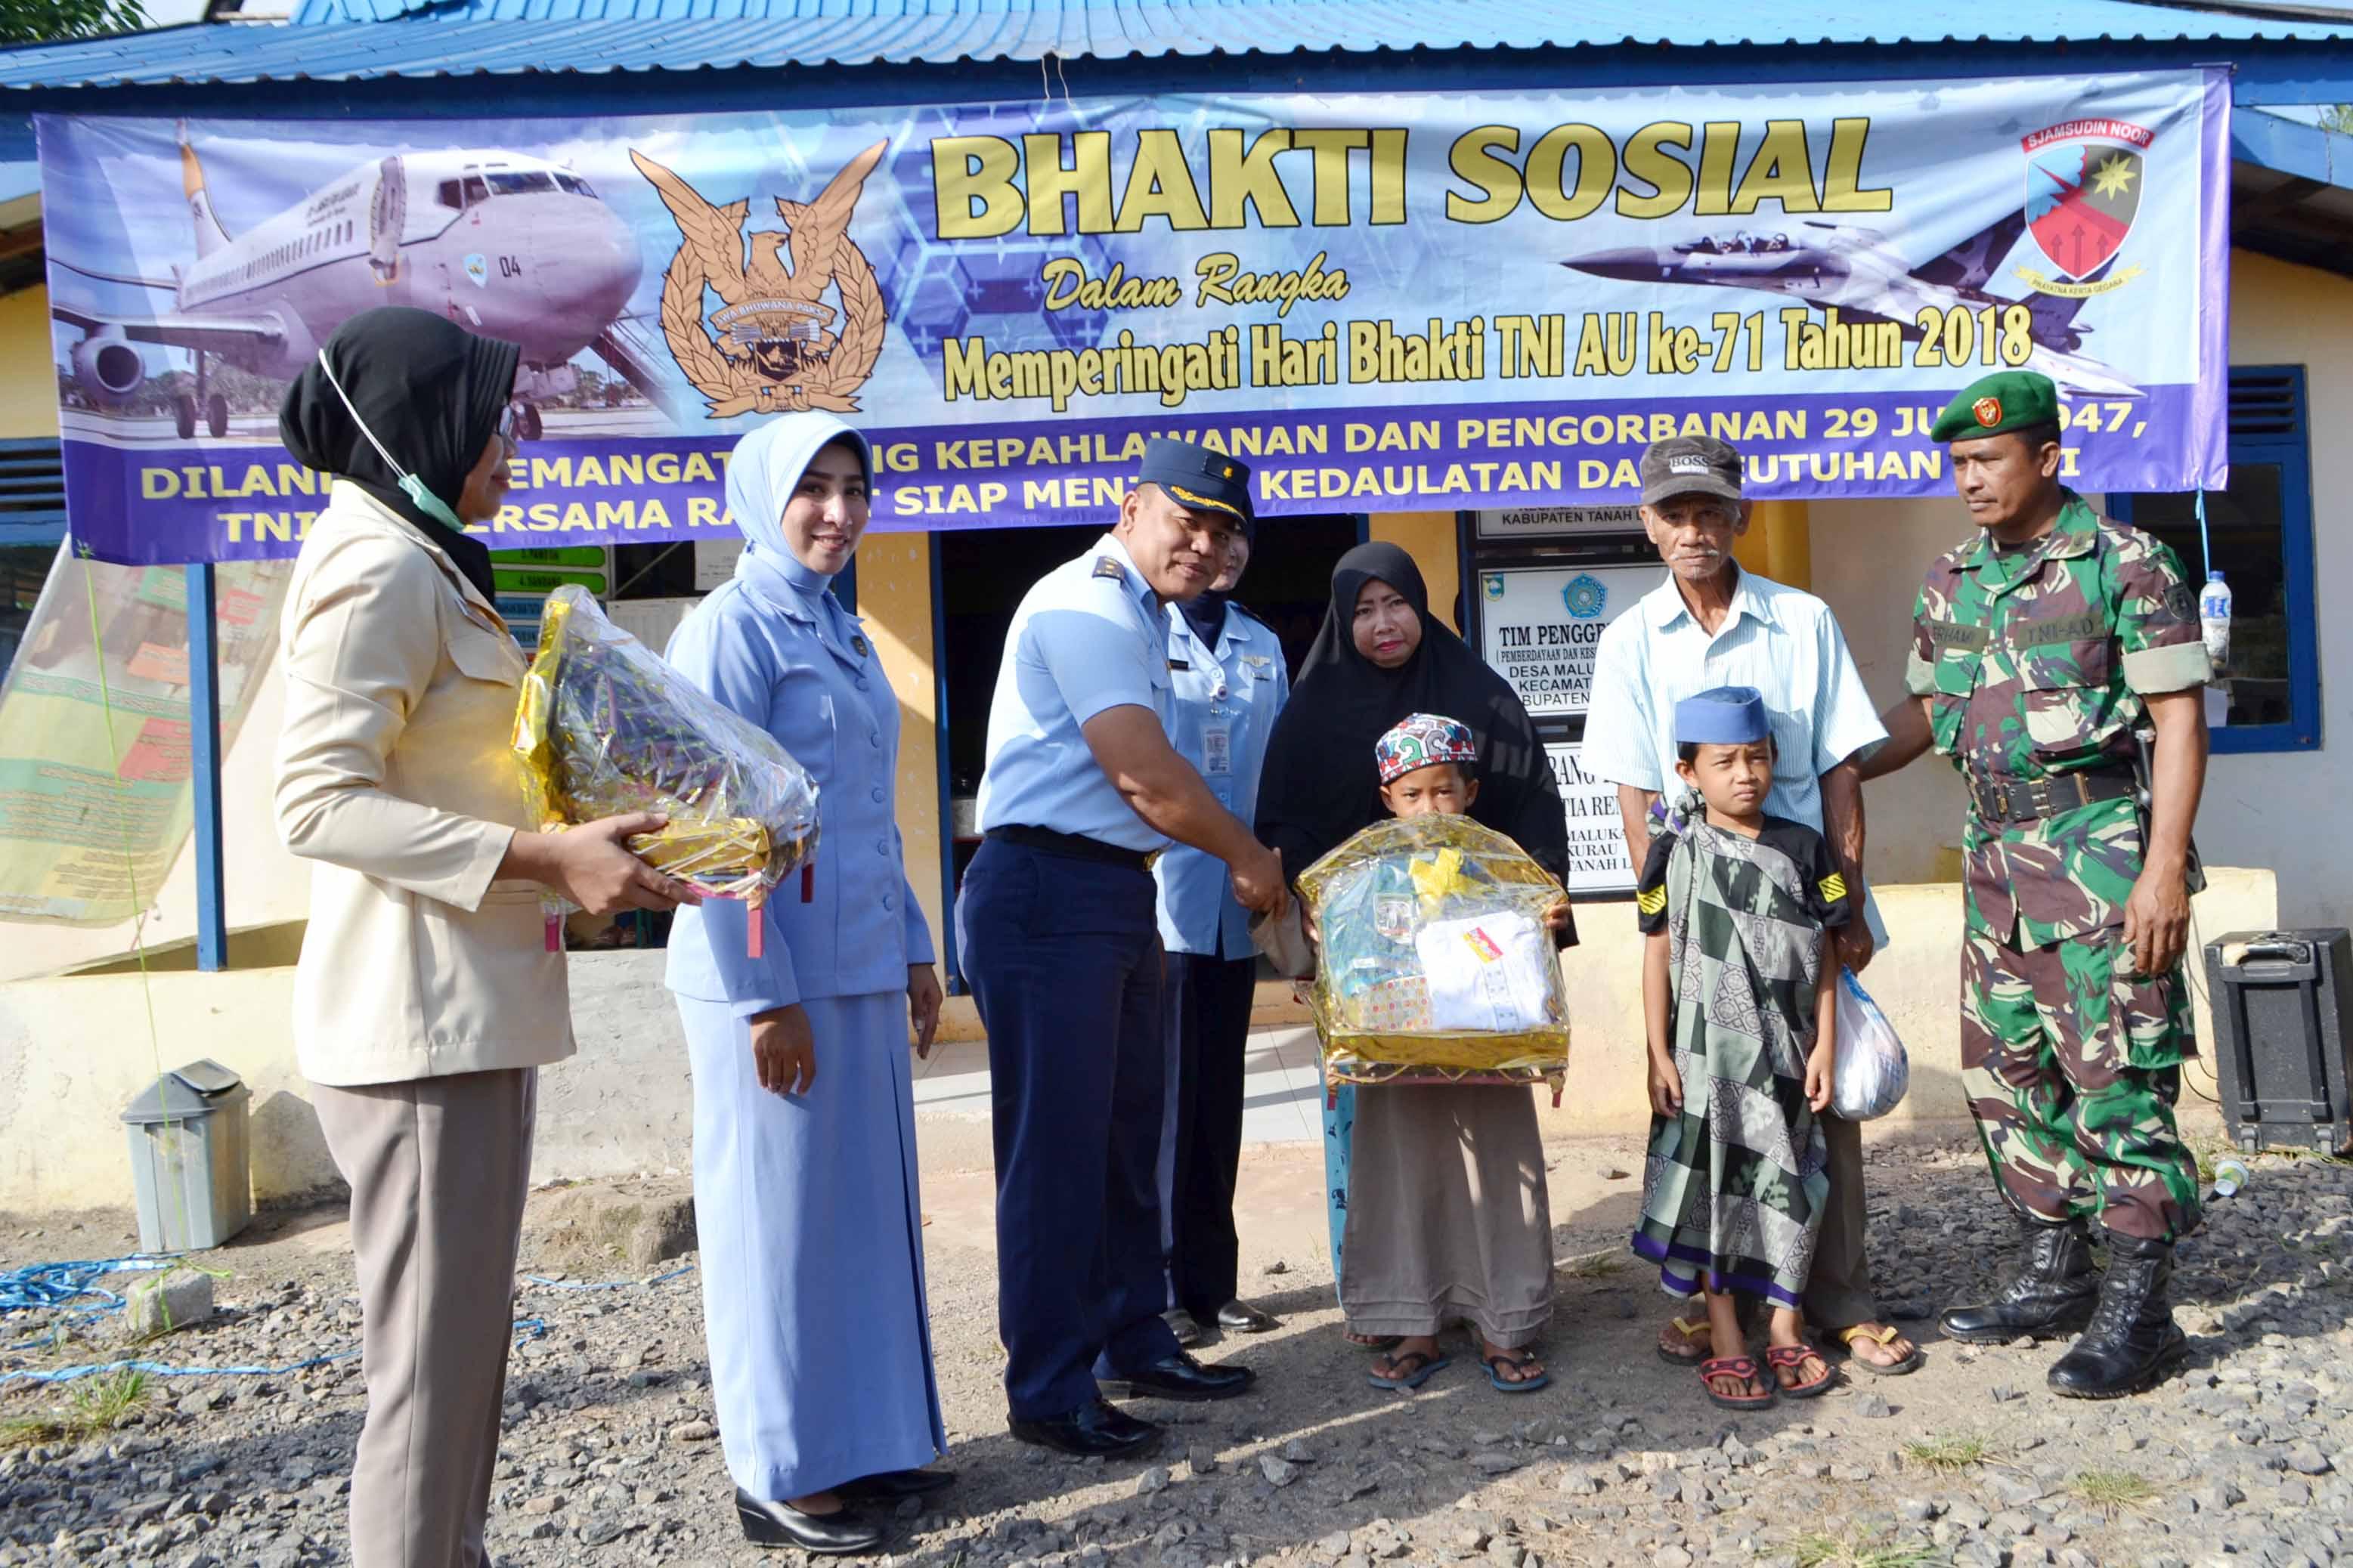 Lanud Sjamsudin Noor Gelar Bhakti Sosial Kesehatan dan Khitanan Massal Memperingati Hari Bhakti TNI AU ke-71 Tahun 2018